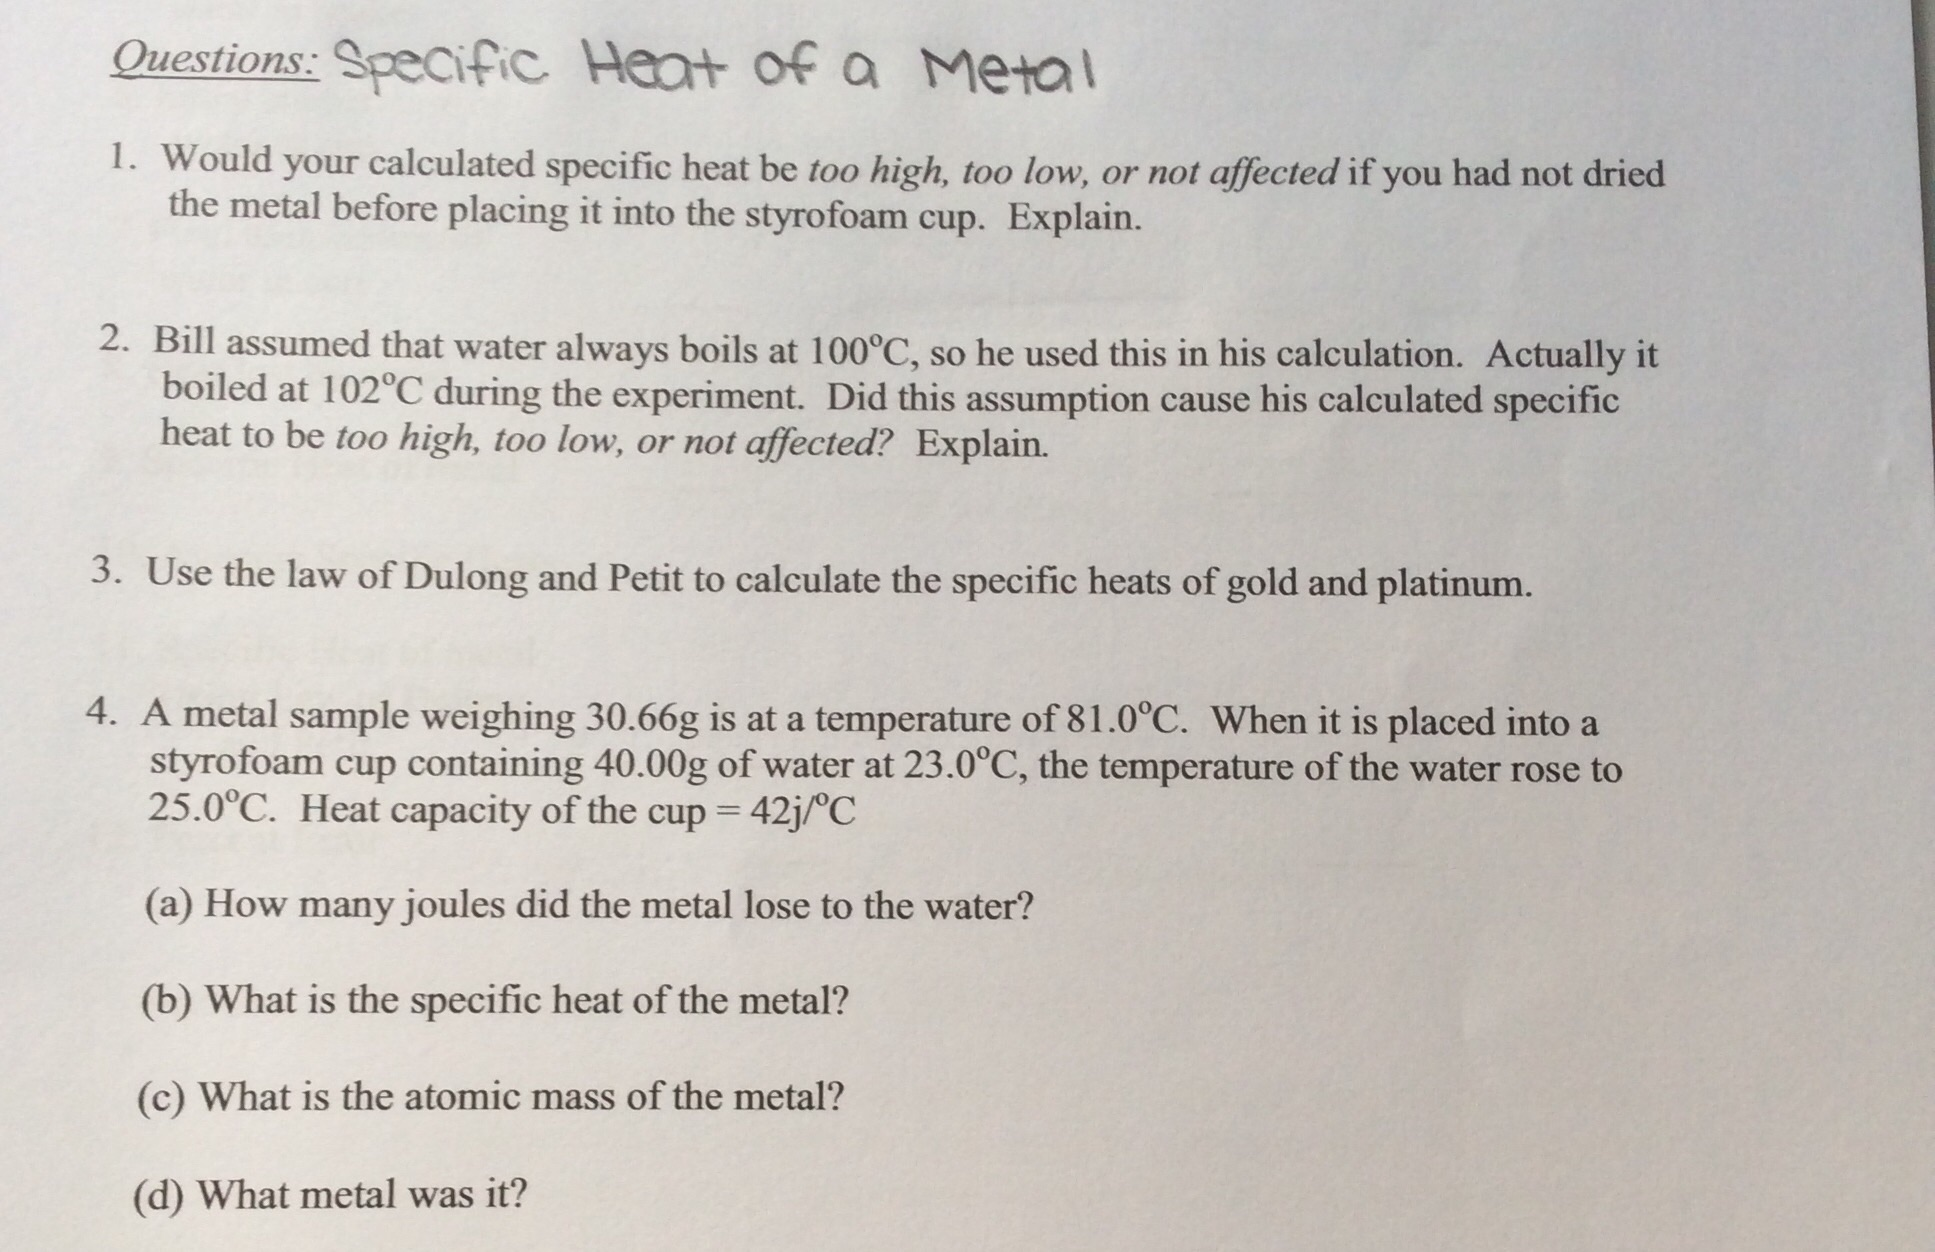 weight percent of acetic acid in vinegar